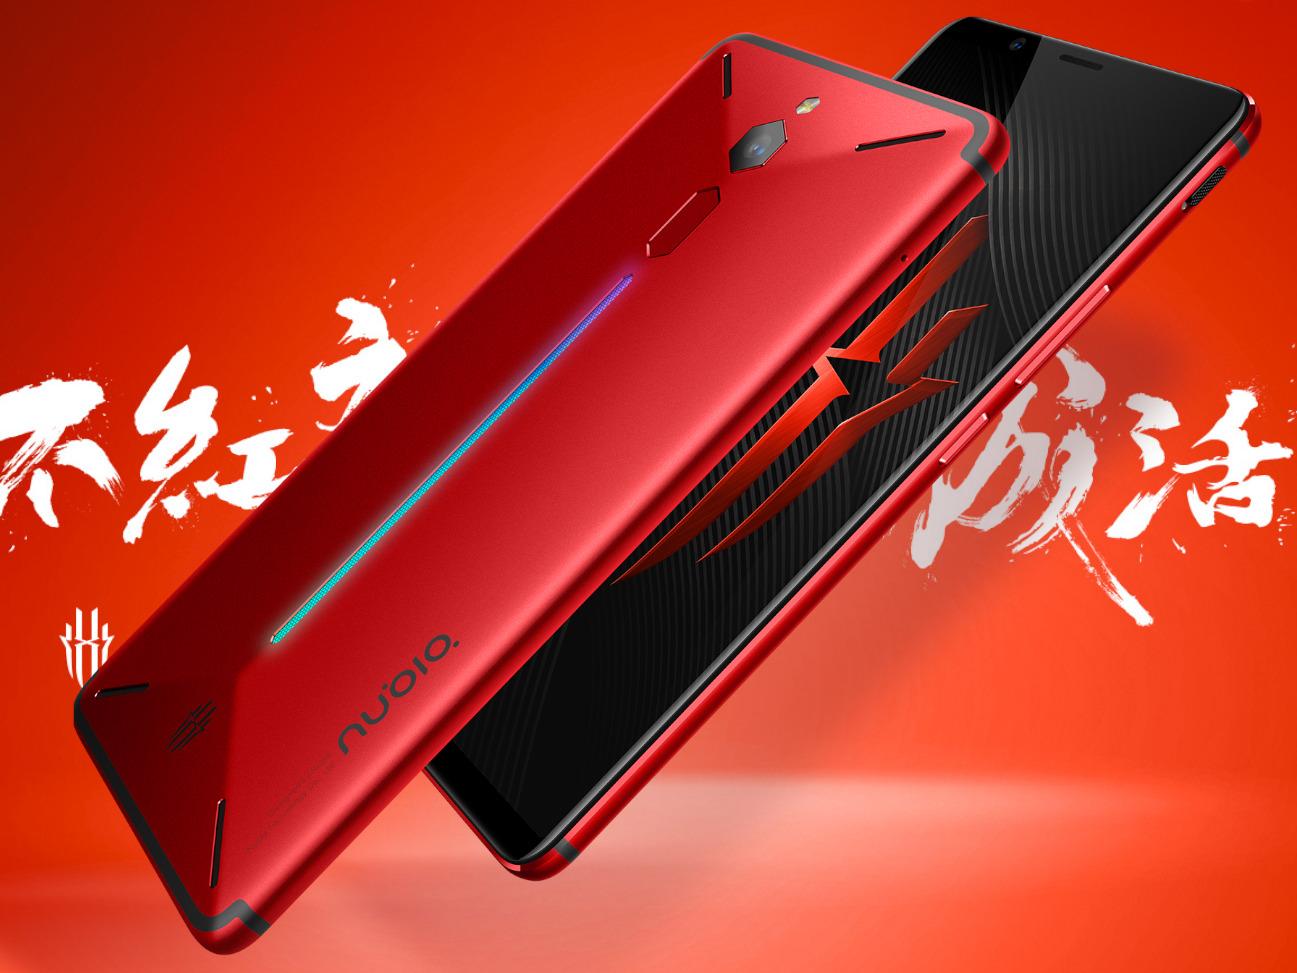 Qualcomm Snapdragon 845-powered ZTE Nubia Red Magic